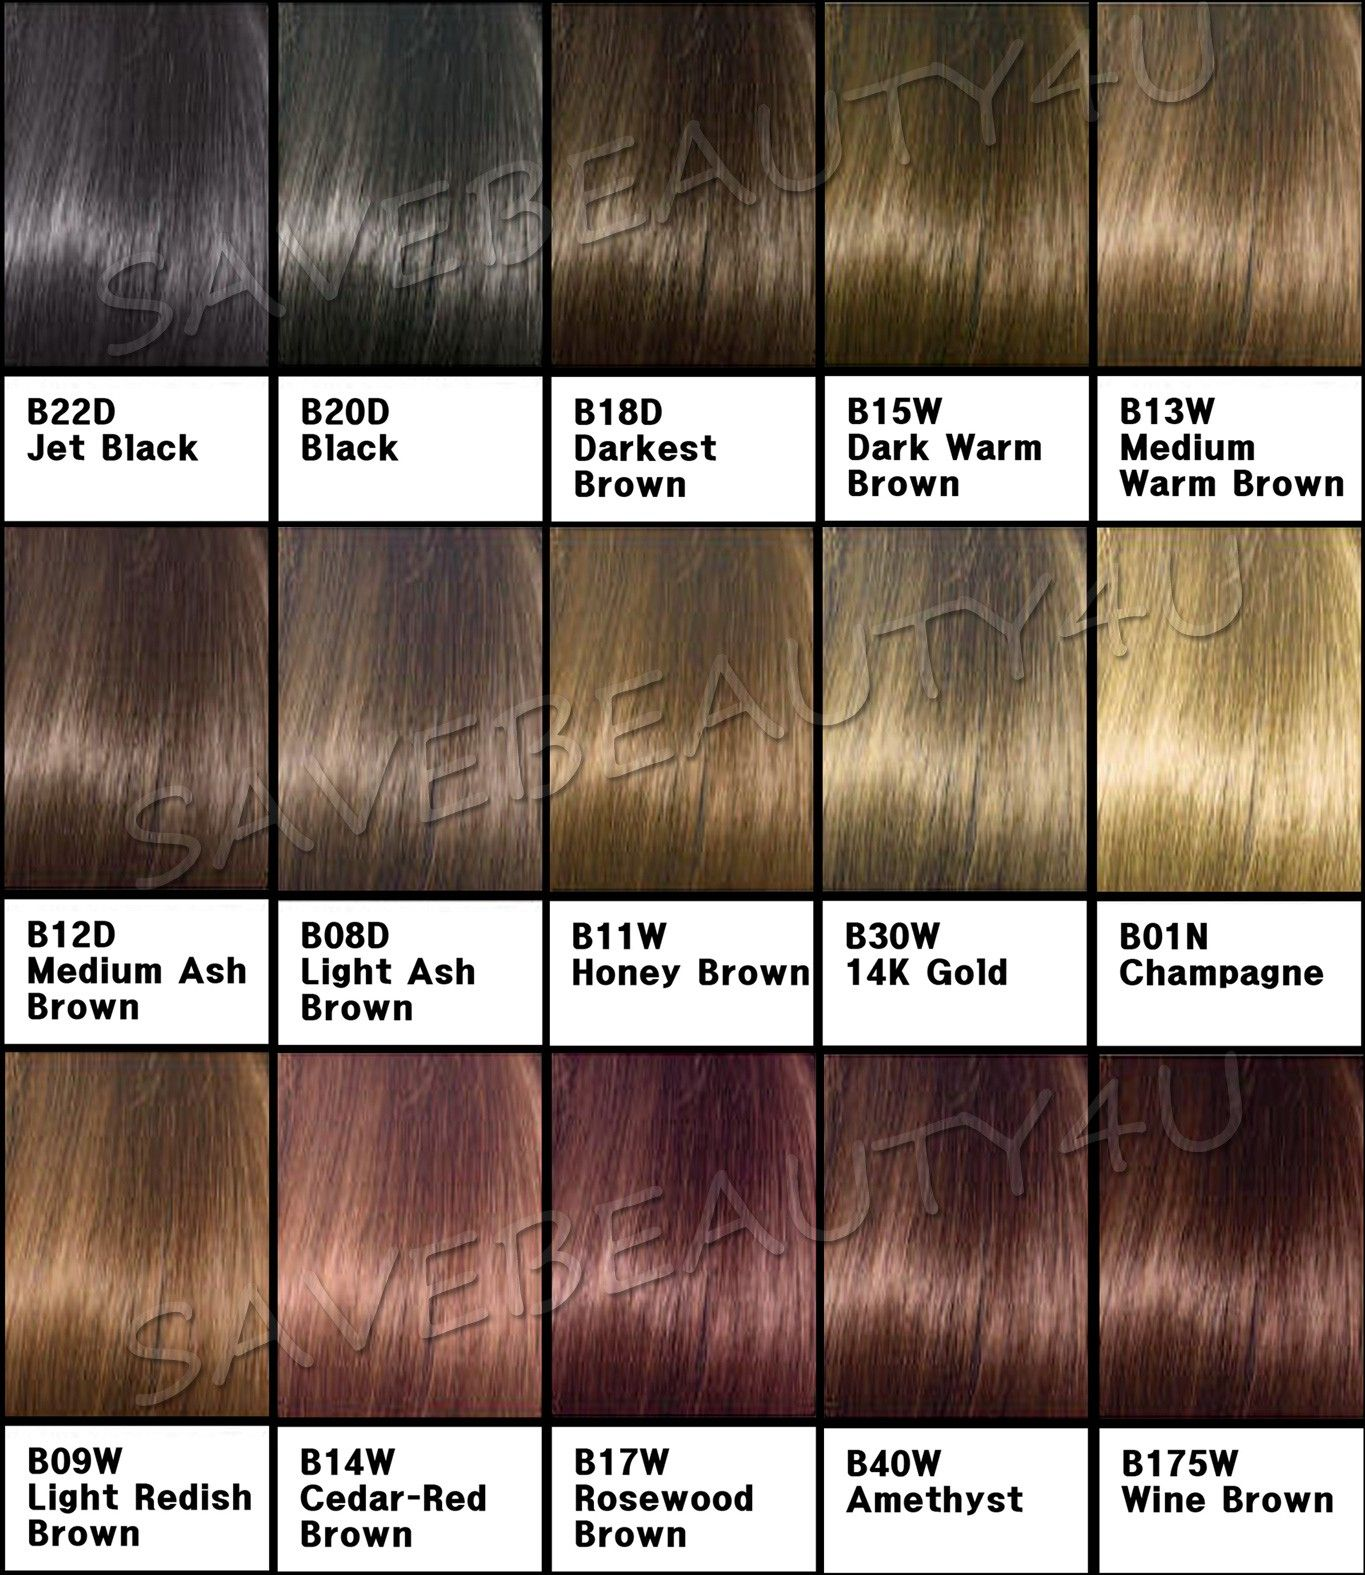 Image Result For Light Ash Brown Hair Color Chart Light Ash Brown Hair Color Chart Brown Hair Color Chart Light Ash Brown Hair